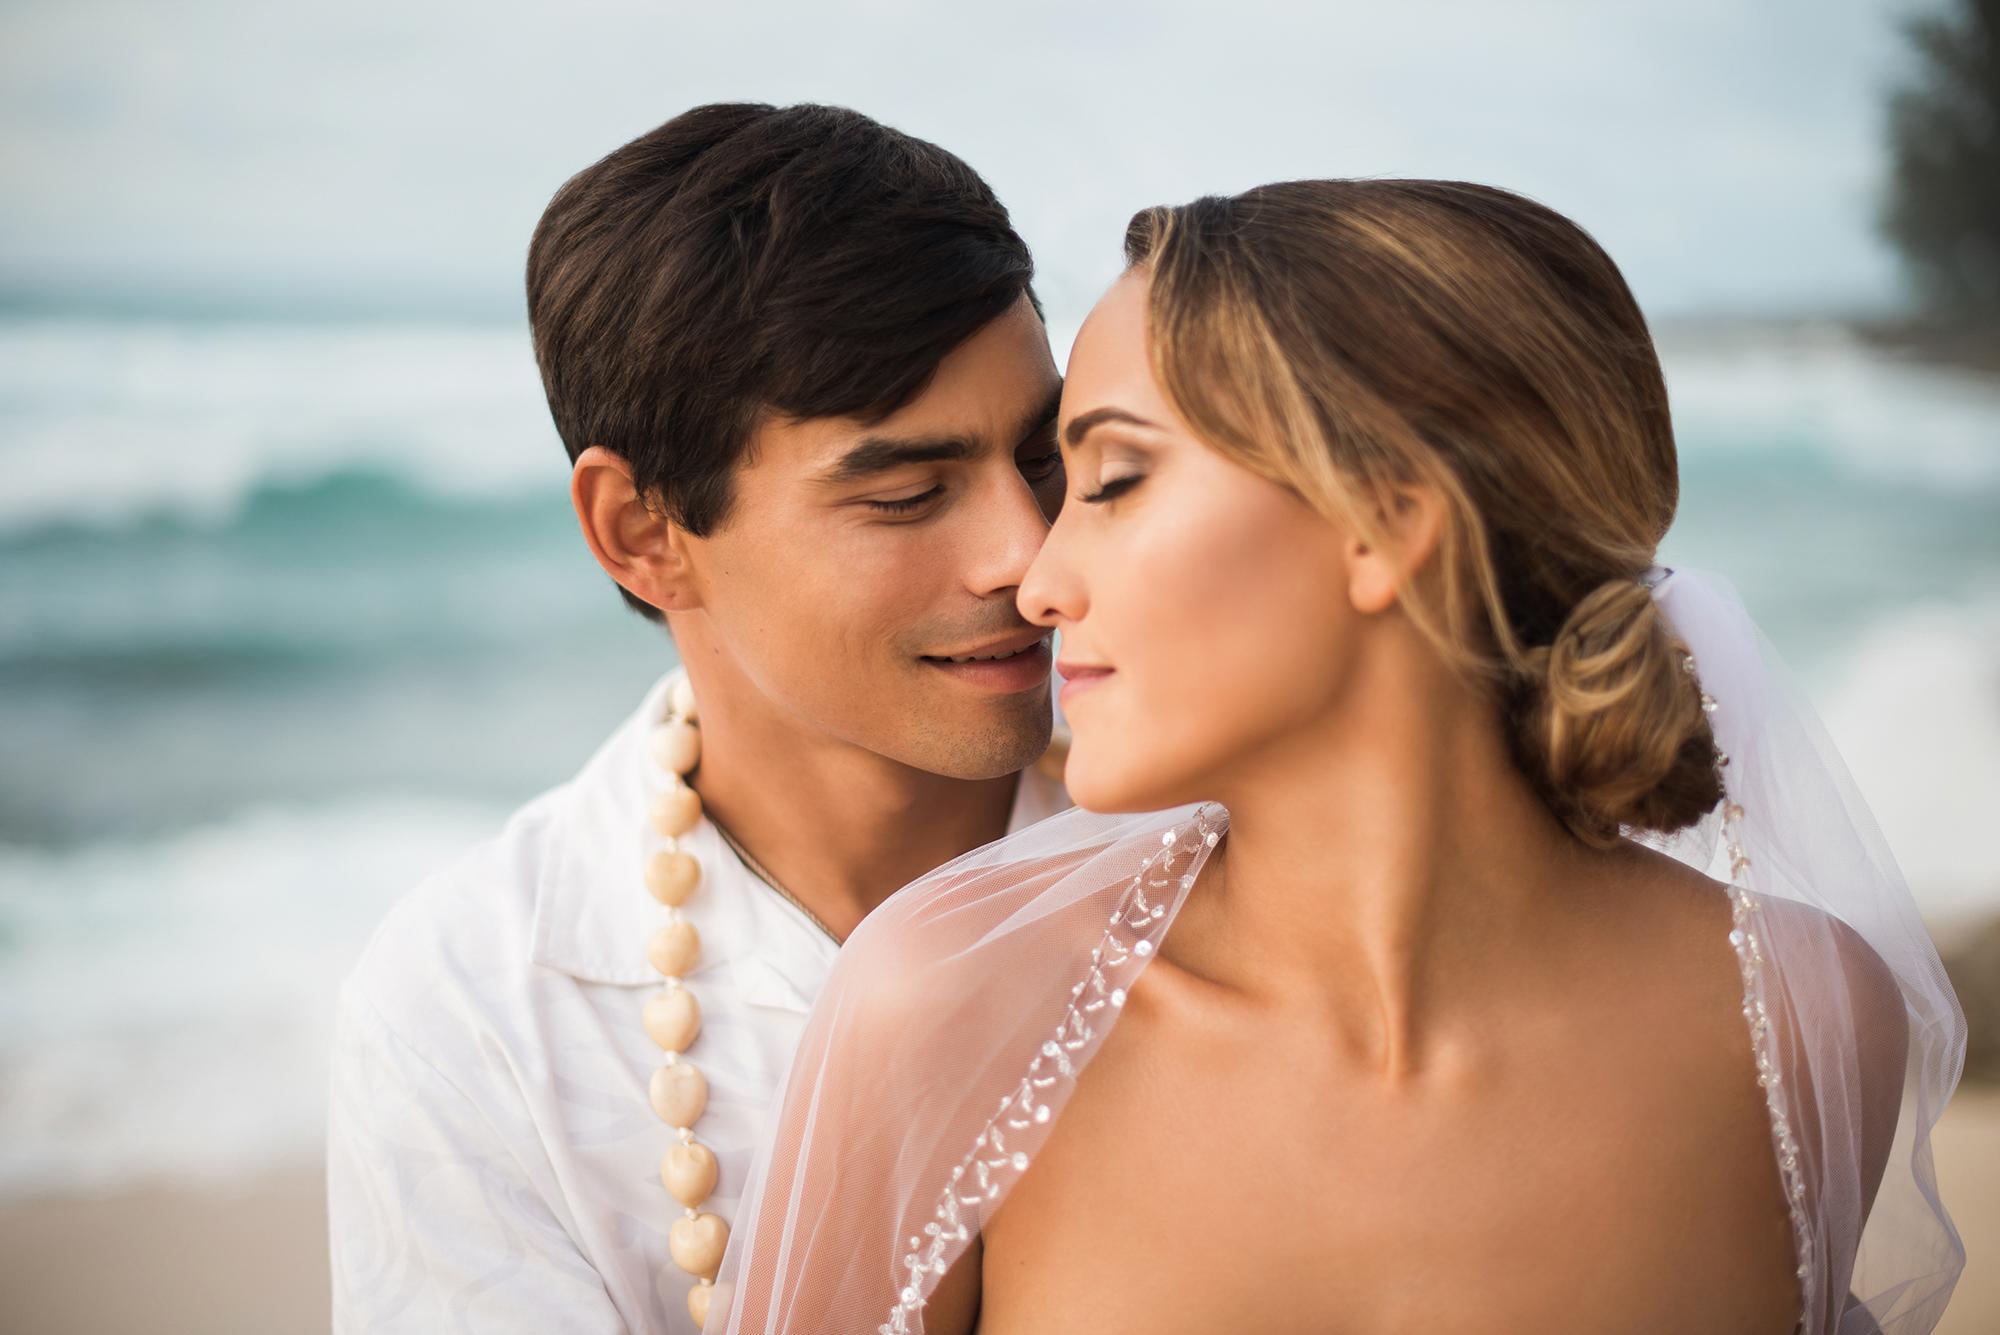 Hawaiian-Elopement-Marianne-Blackham-Photography-horiz-couple.jpg